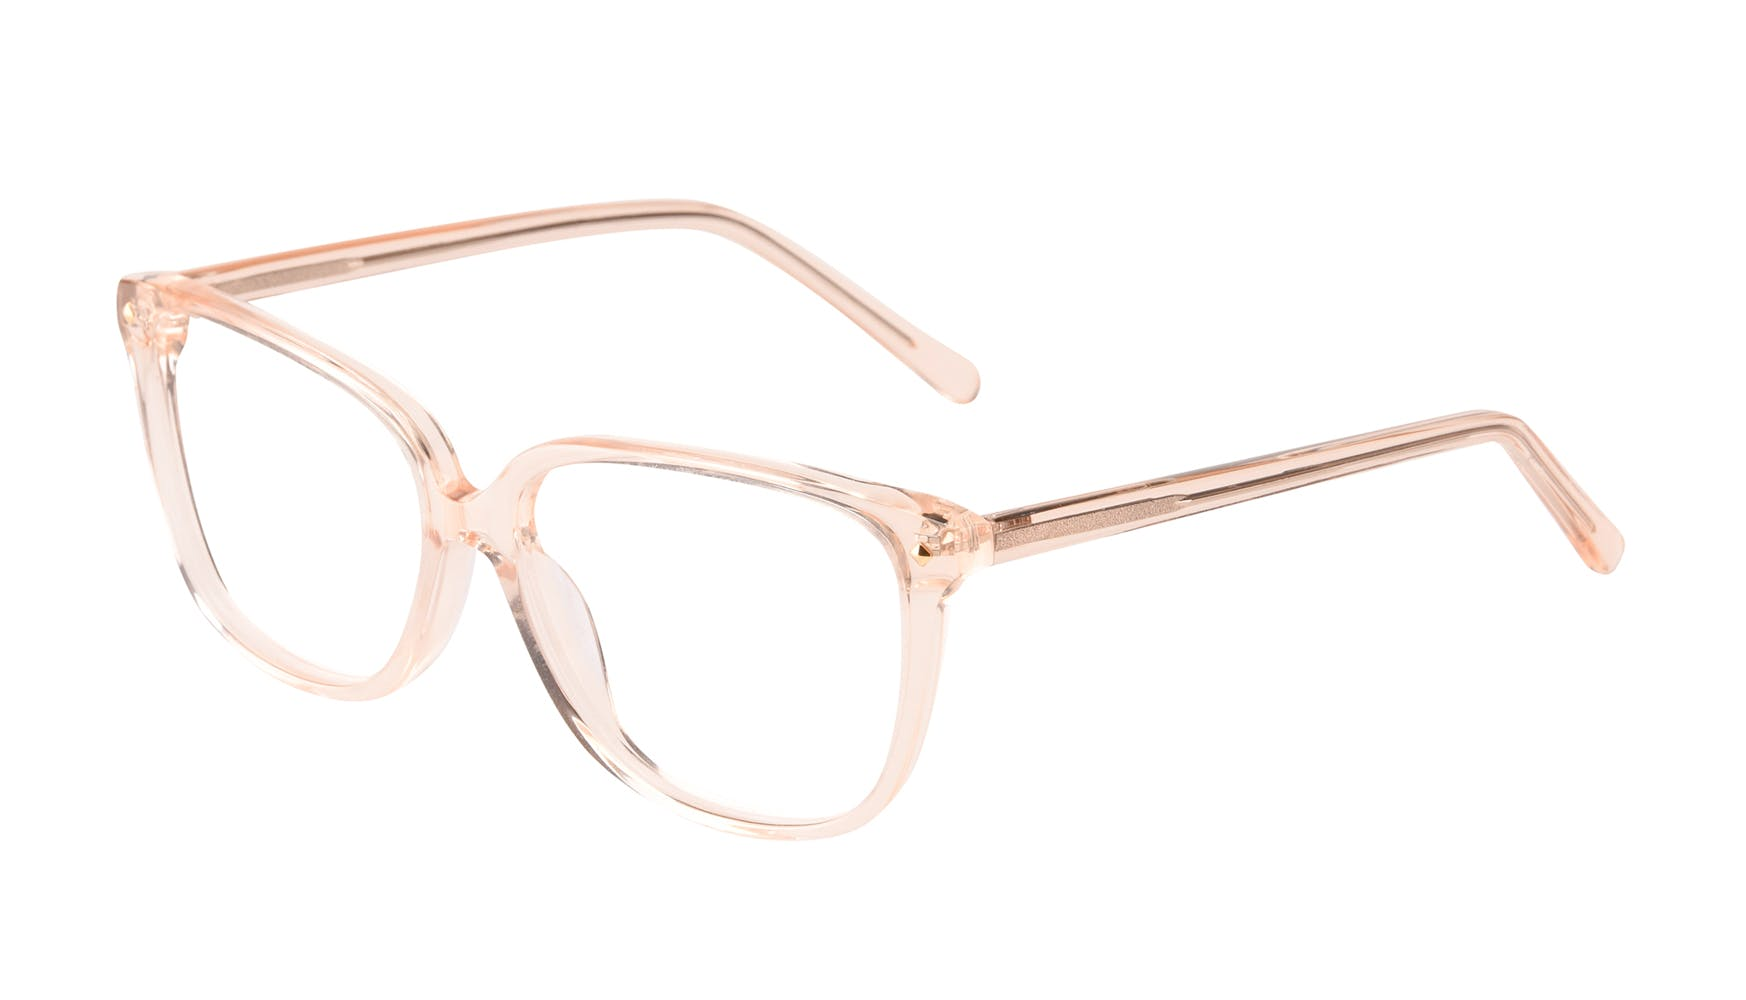 Affordable Fashion Glasses Rectangle Square Eyeglasses Women Muse Blond Tilt